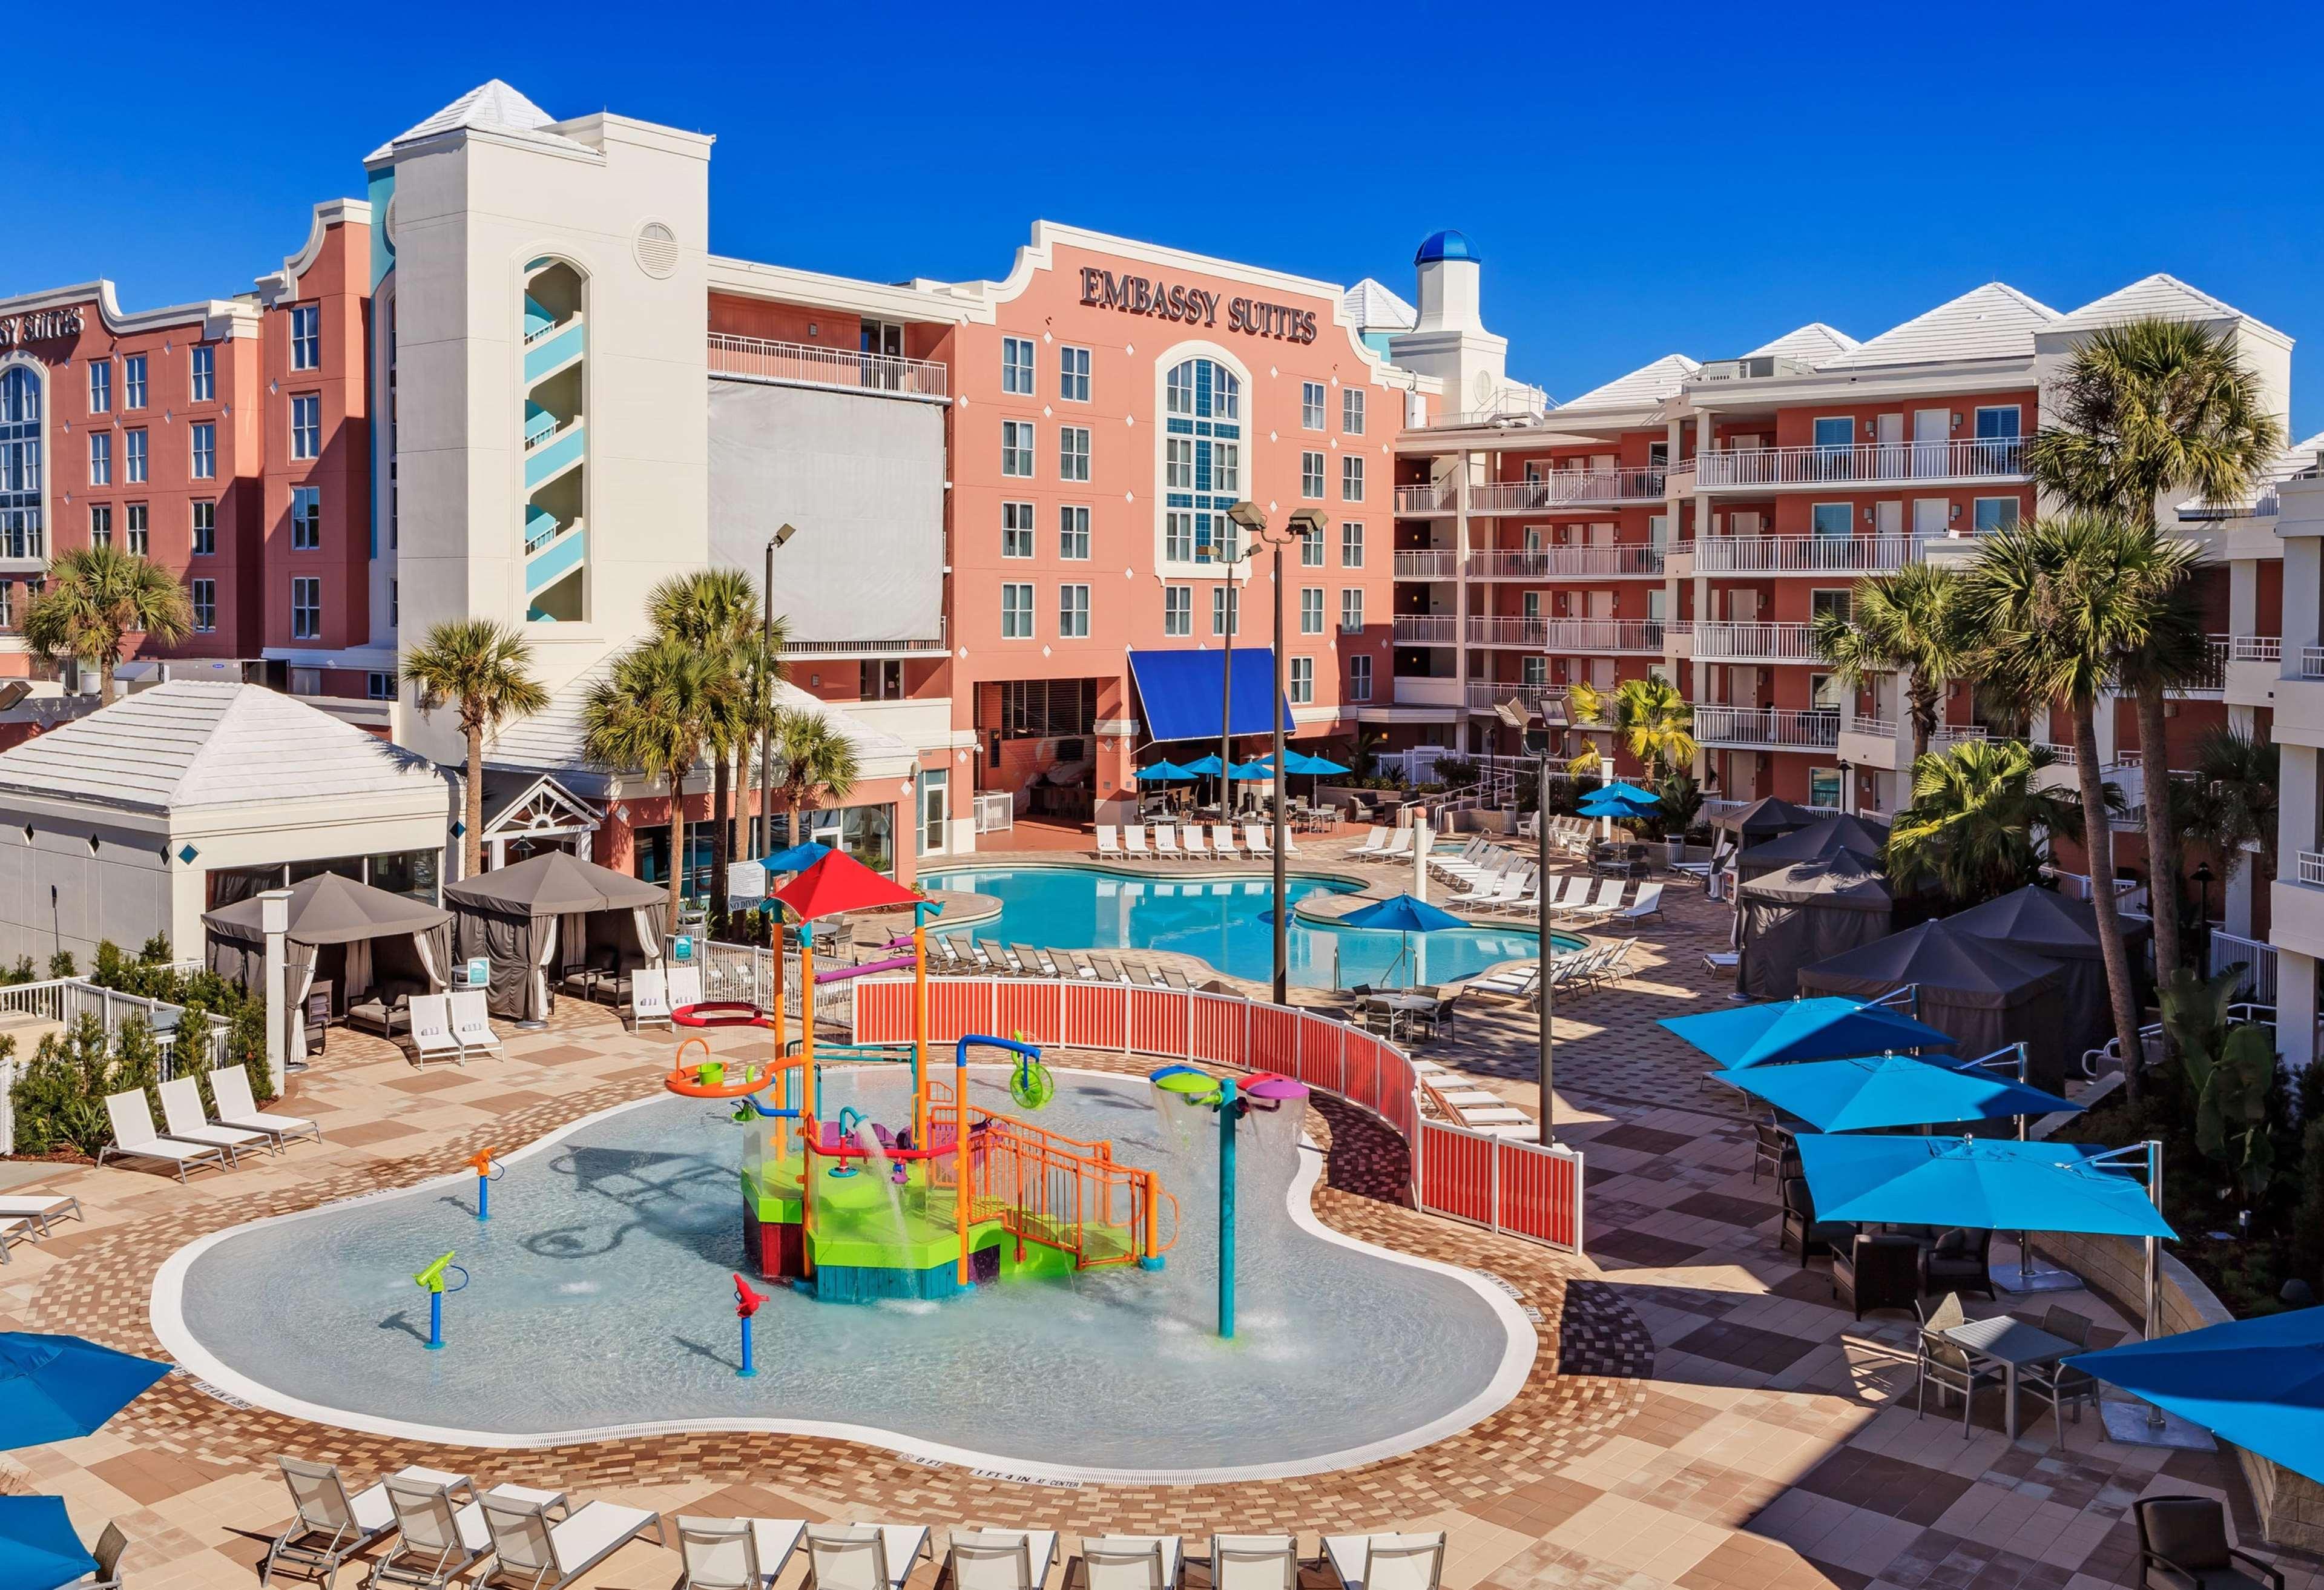 Hotels Near Me Orlando Buena Vista